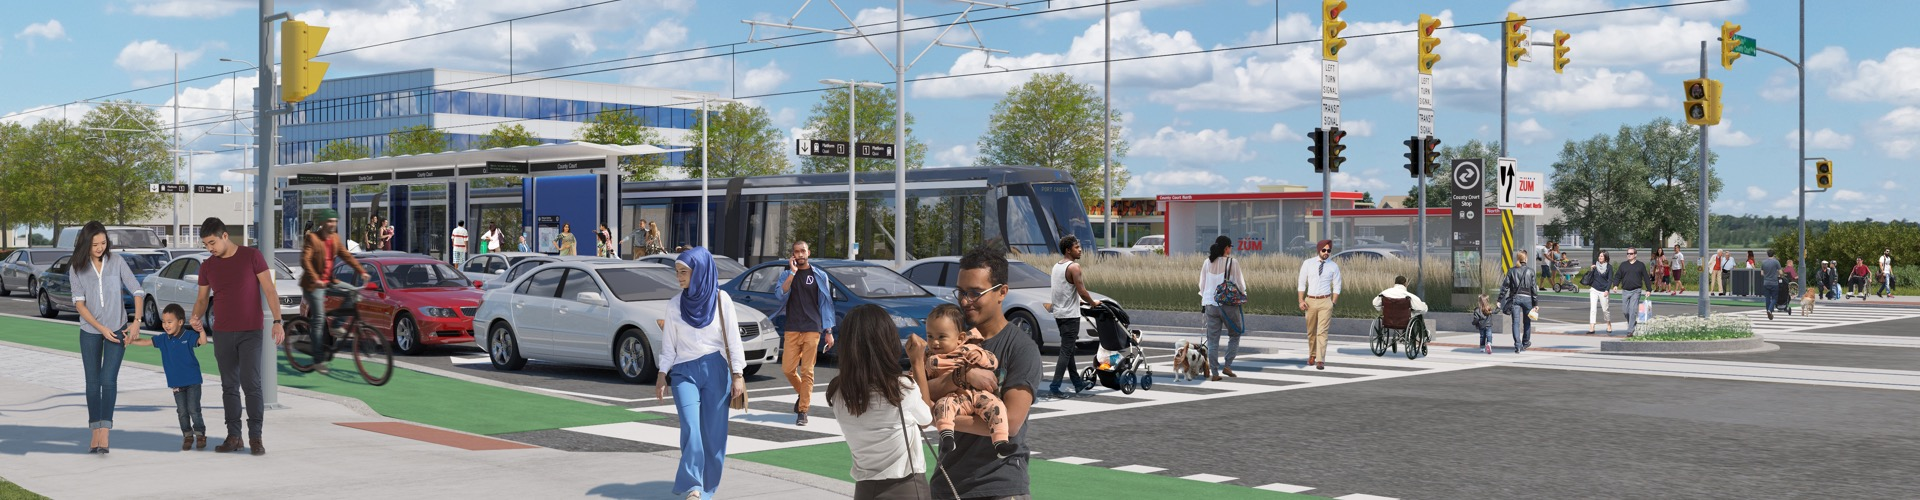 Photo rendering of new Hurontario Light Rail Trainsit (LRT)